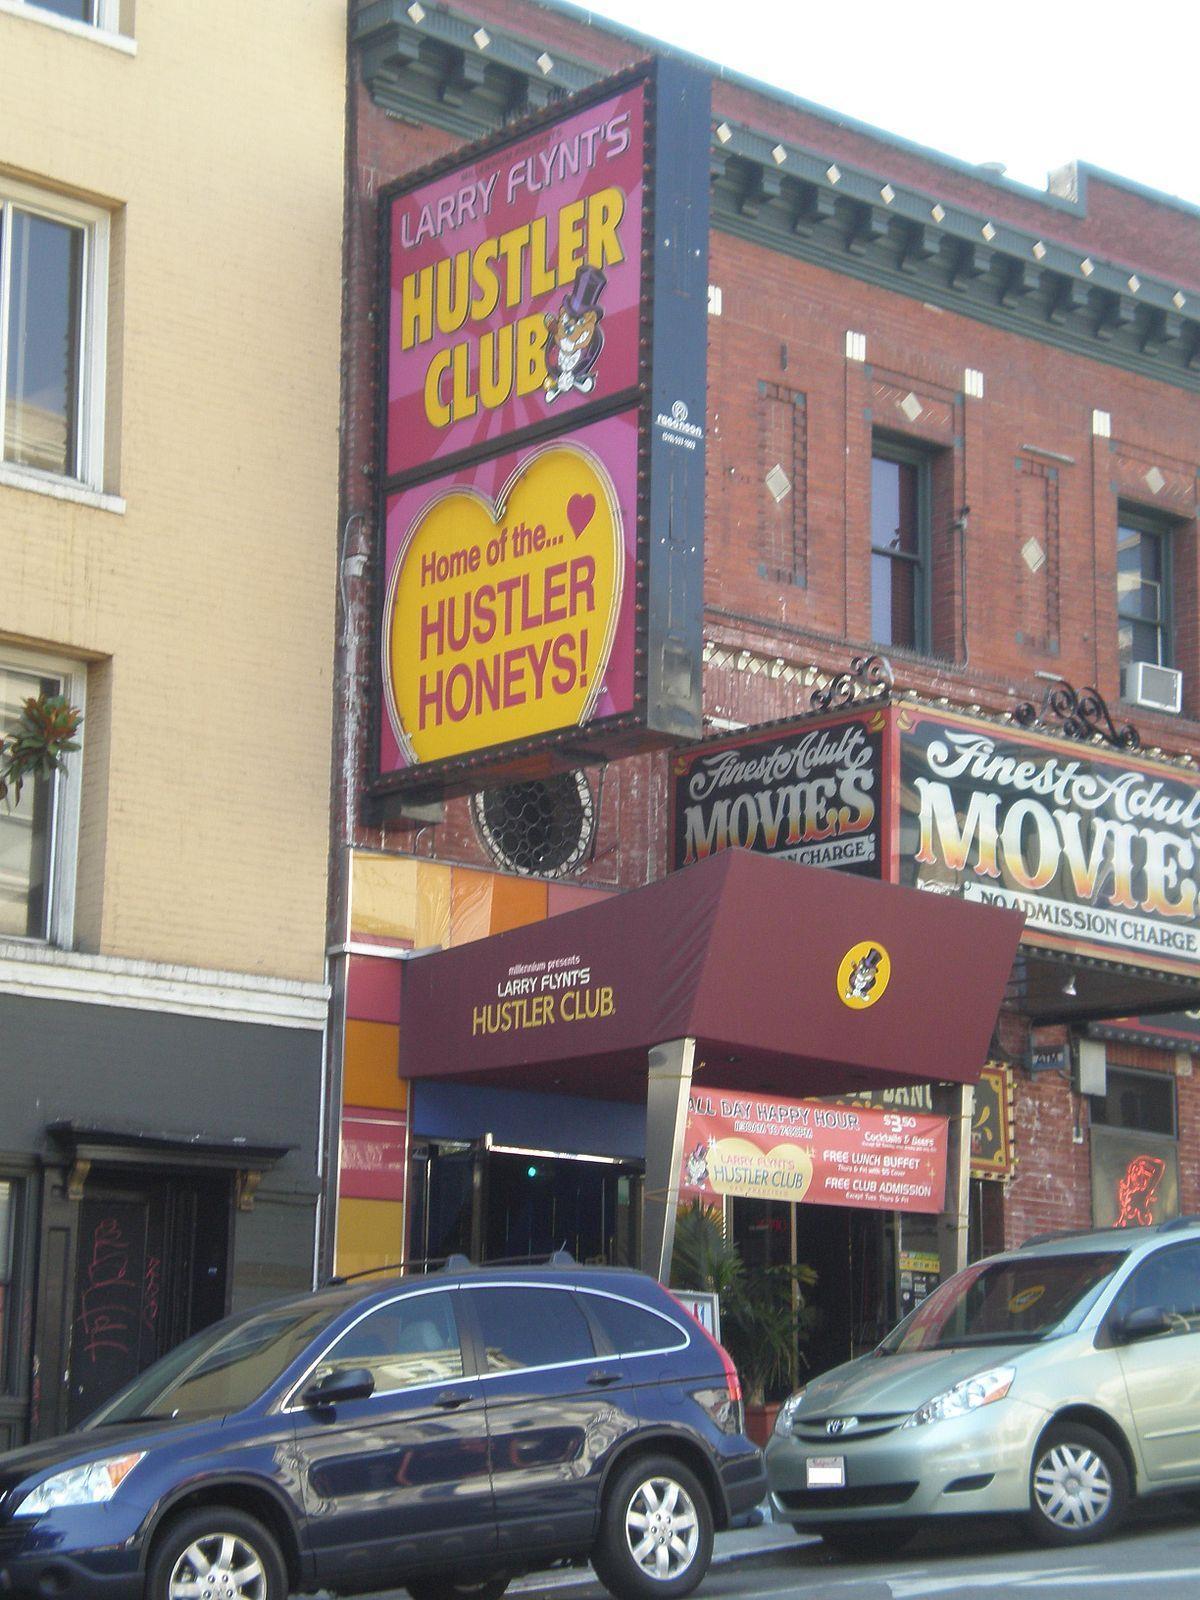 Fire S. reccomend Hustler club in philadelphia pa